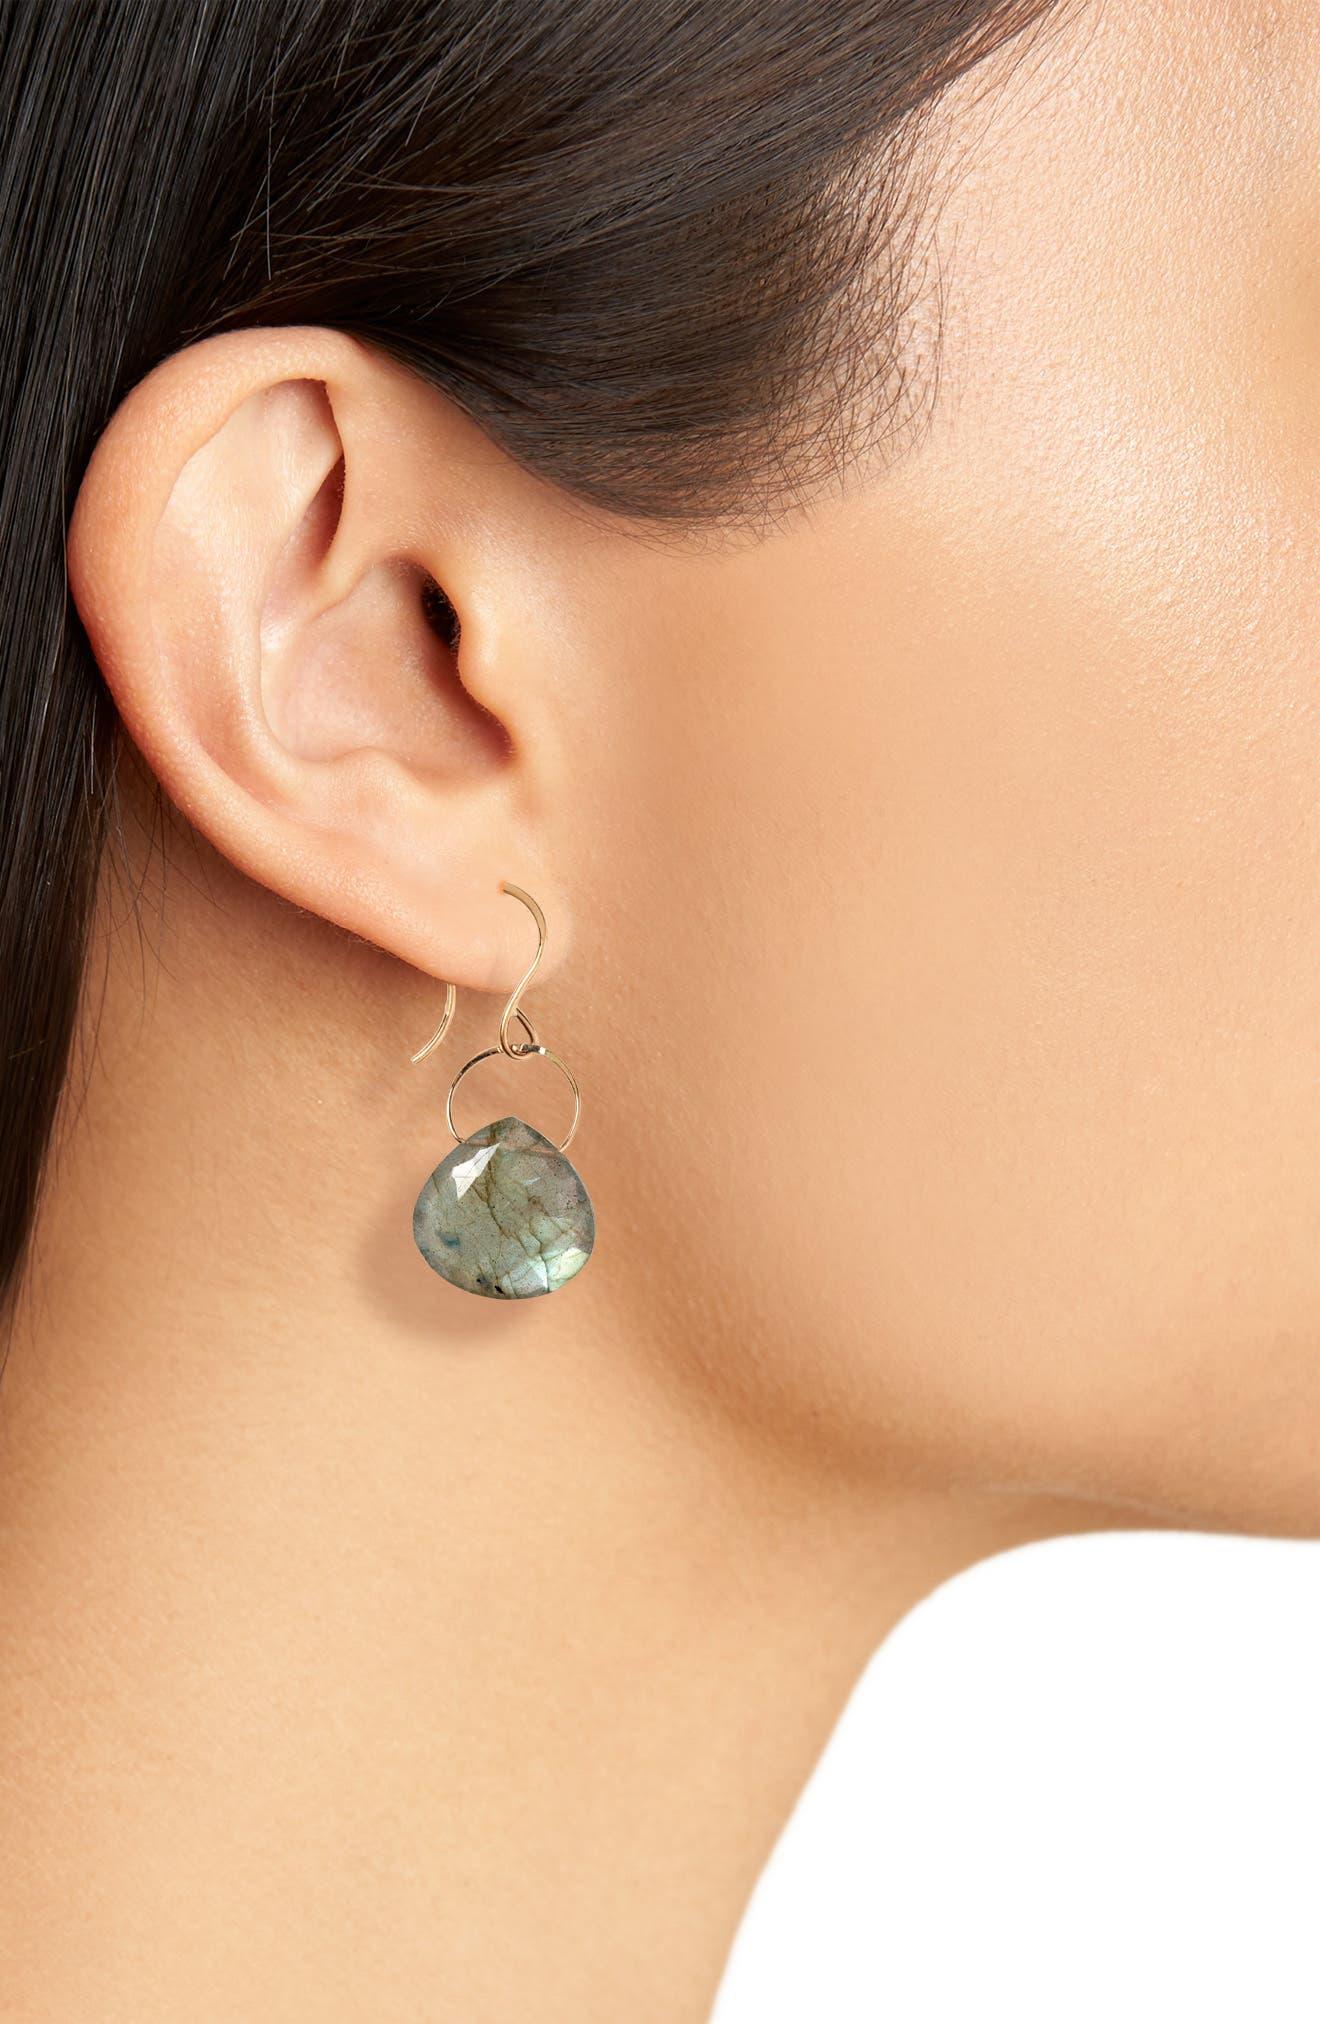 Semiprecious Stone Drop Earrings,                             Alternate thumbnail 3, color,                             LABRADORITE/ YELLOW GOLD